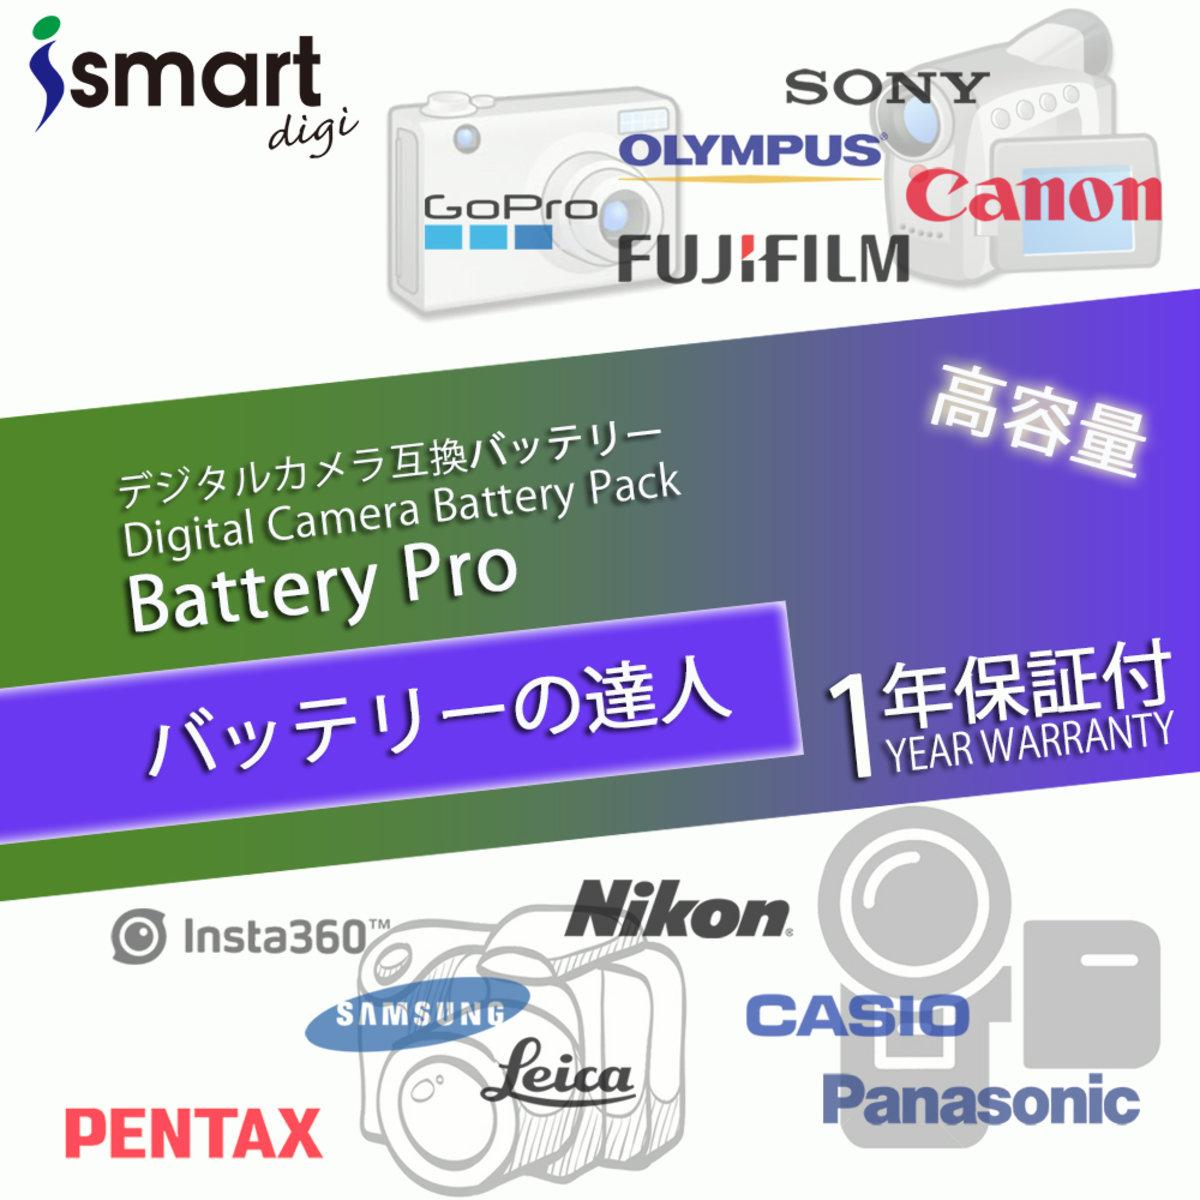 "Panasonic Digital Camera Battery (For:Lumix DMC-FS1 Series, Lumix DMC-FS1Lumix DMC-FS2 Series,""Lumix DMC-FS2Lumix DMC-FX01 Series)"